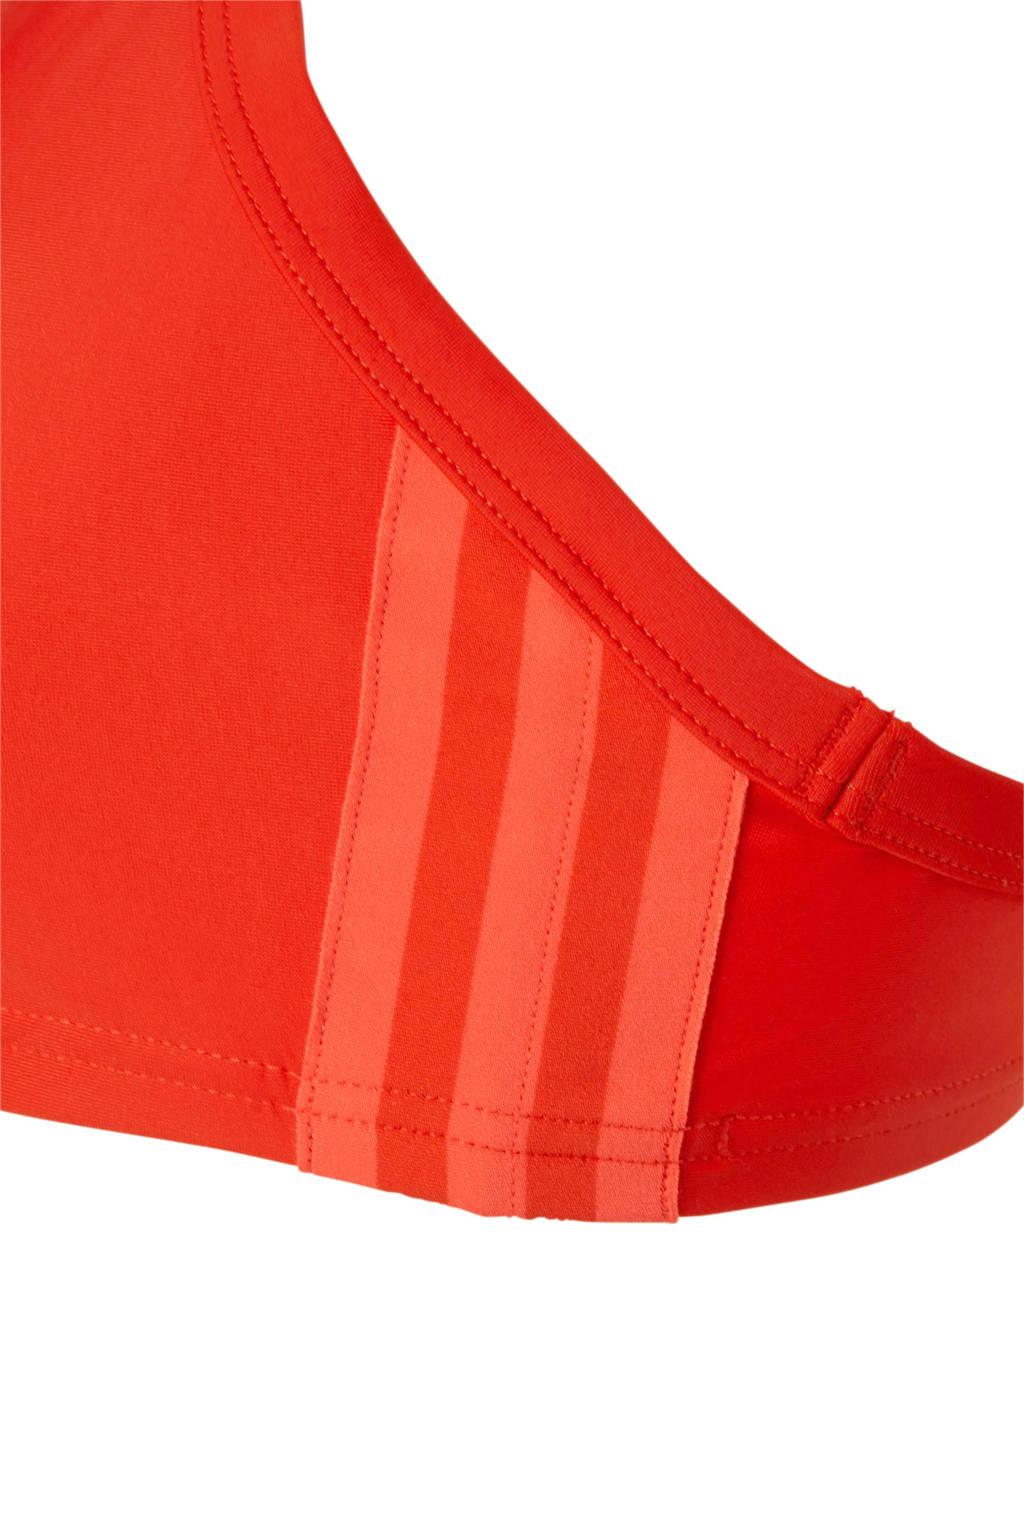 Adidassportbikini Adidassportbikini stripes 3 stripes 3 Rood qw6YwE